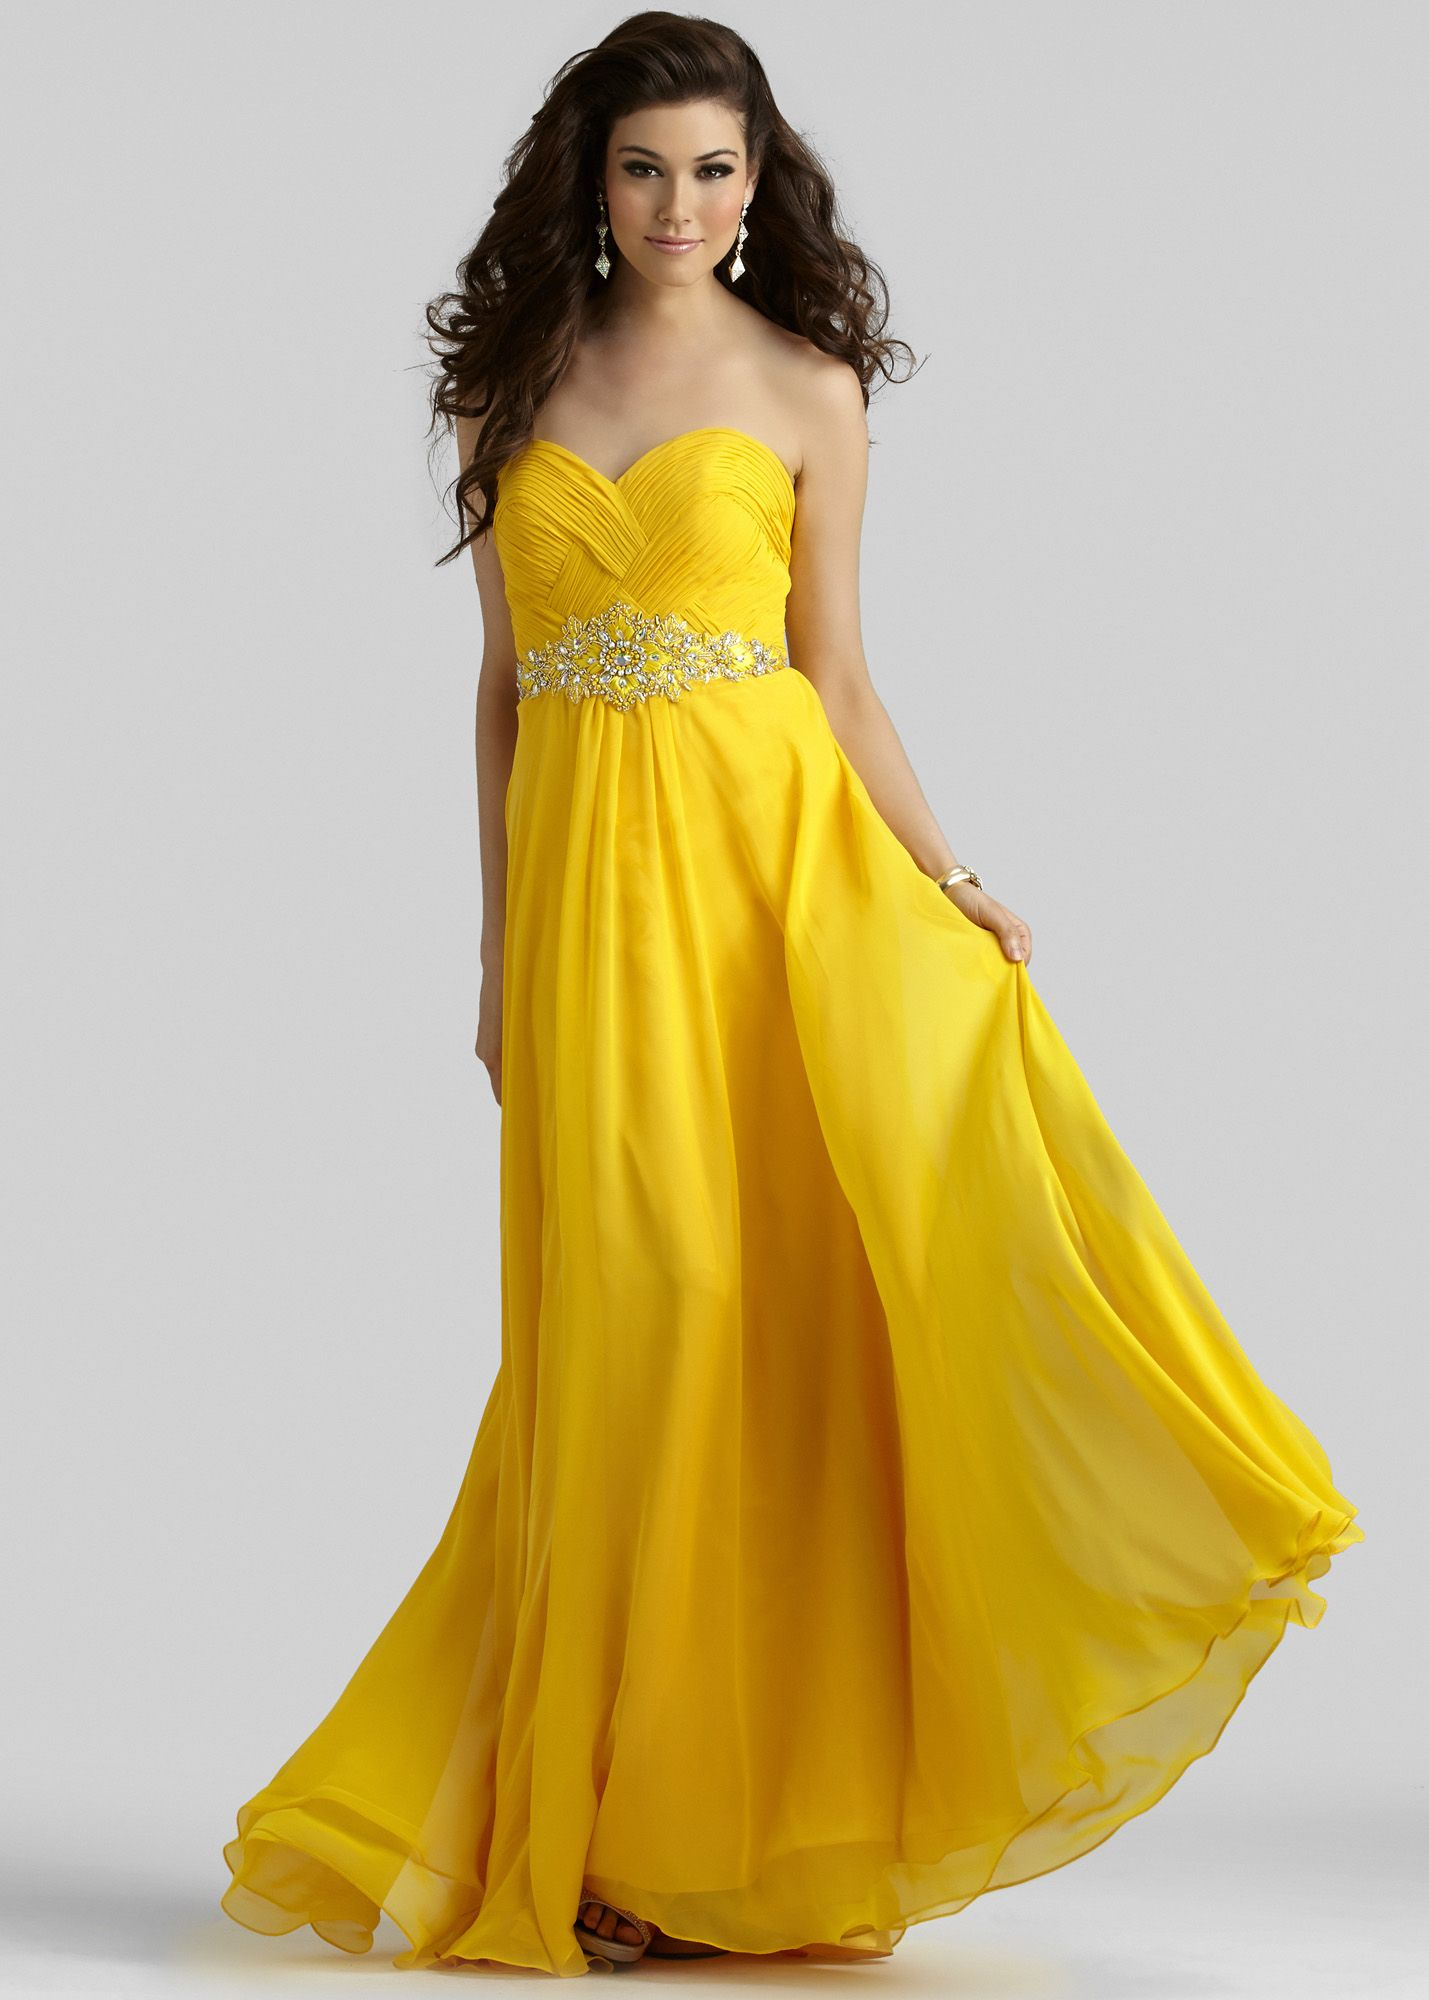 Clarisse 2108 Sunflower Strapless Chiffon Prom Dress Prom Dresses Yellow Cheap Prom Dresses Long Chiffon Prom Dress [ 2000 x 1429 Pixel ]